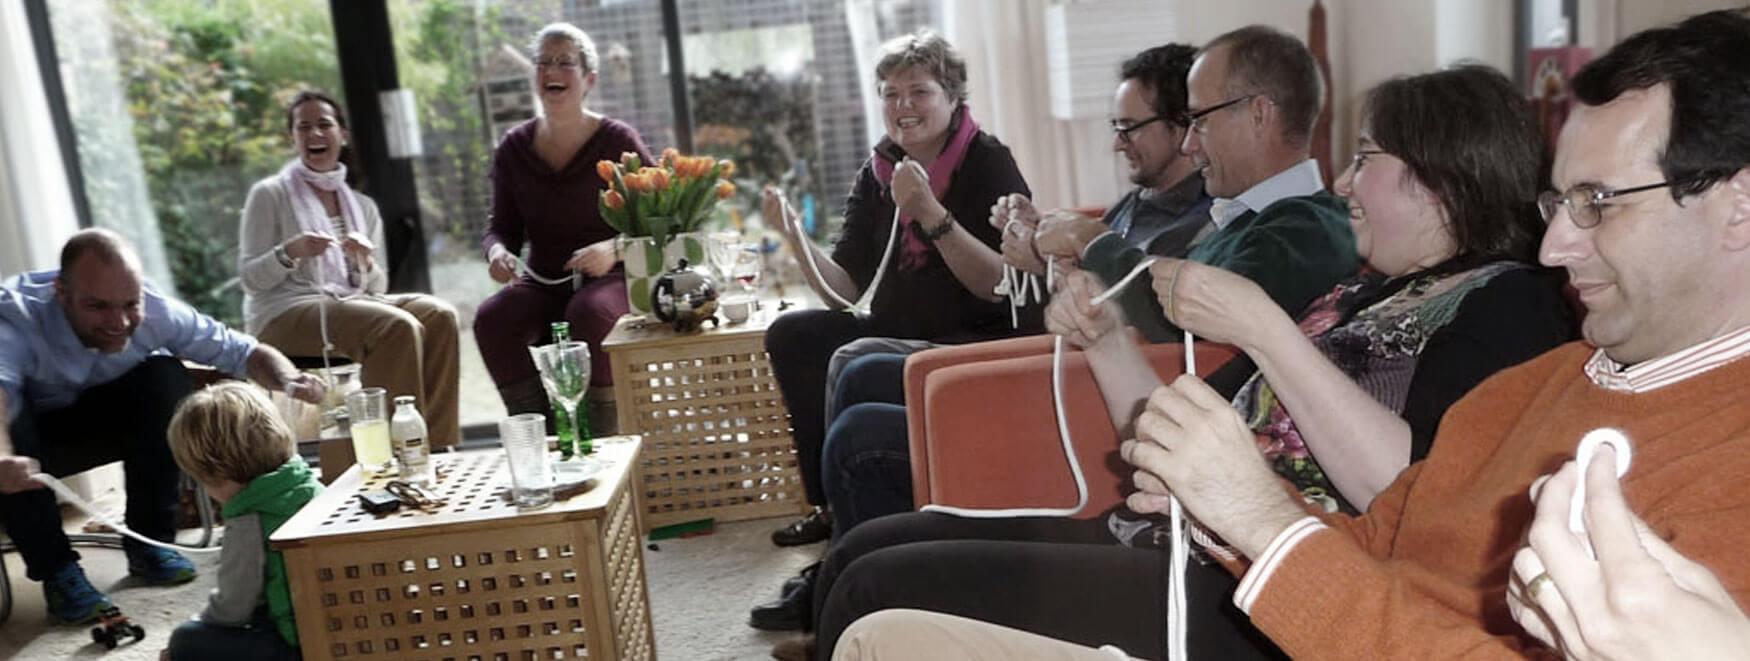 entertainmens-goochel-workshop